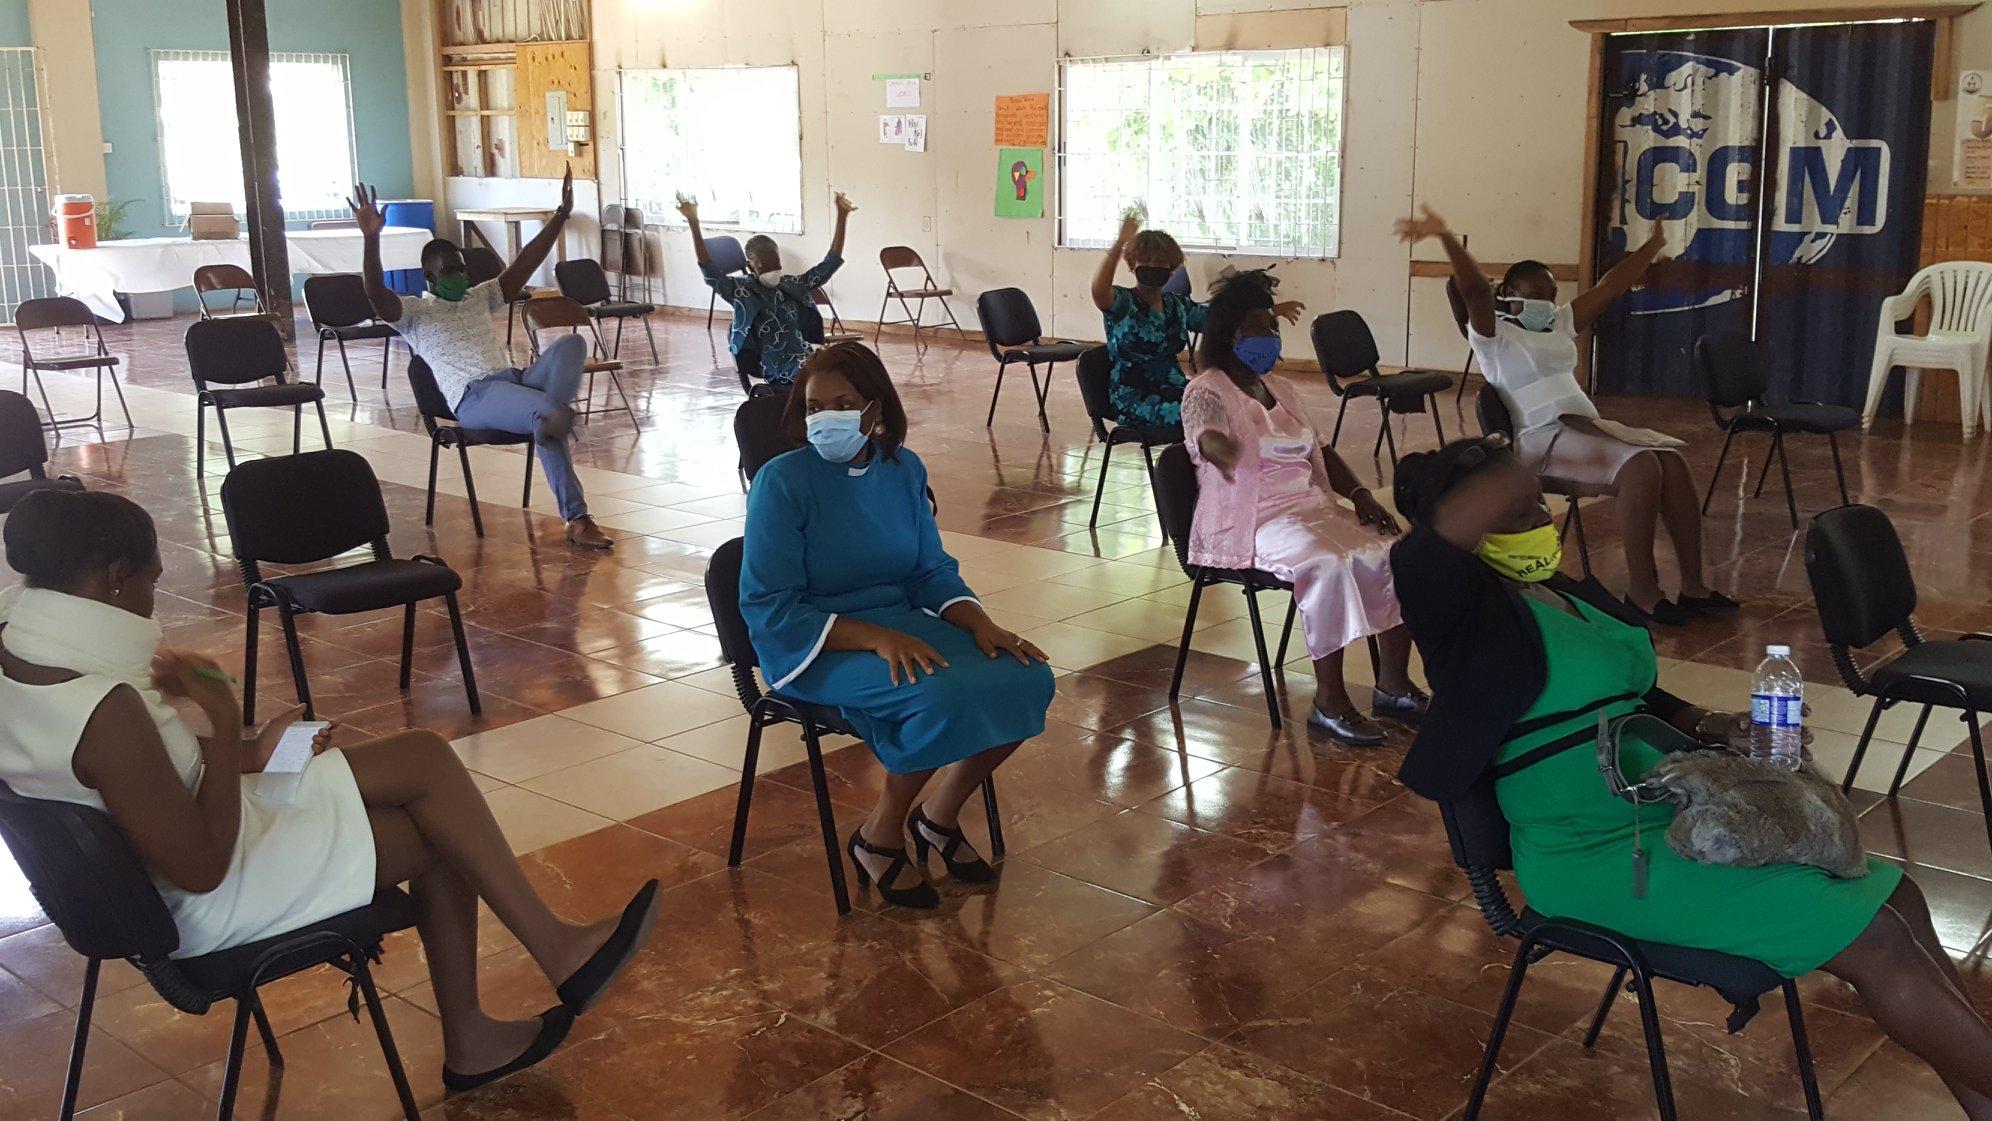 Jamaica_Rachel_Pellet_churchinjamaicacovid19.jpg